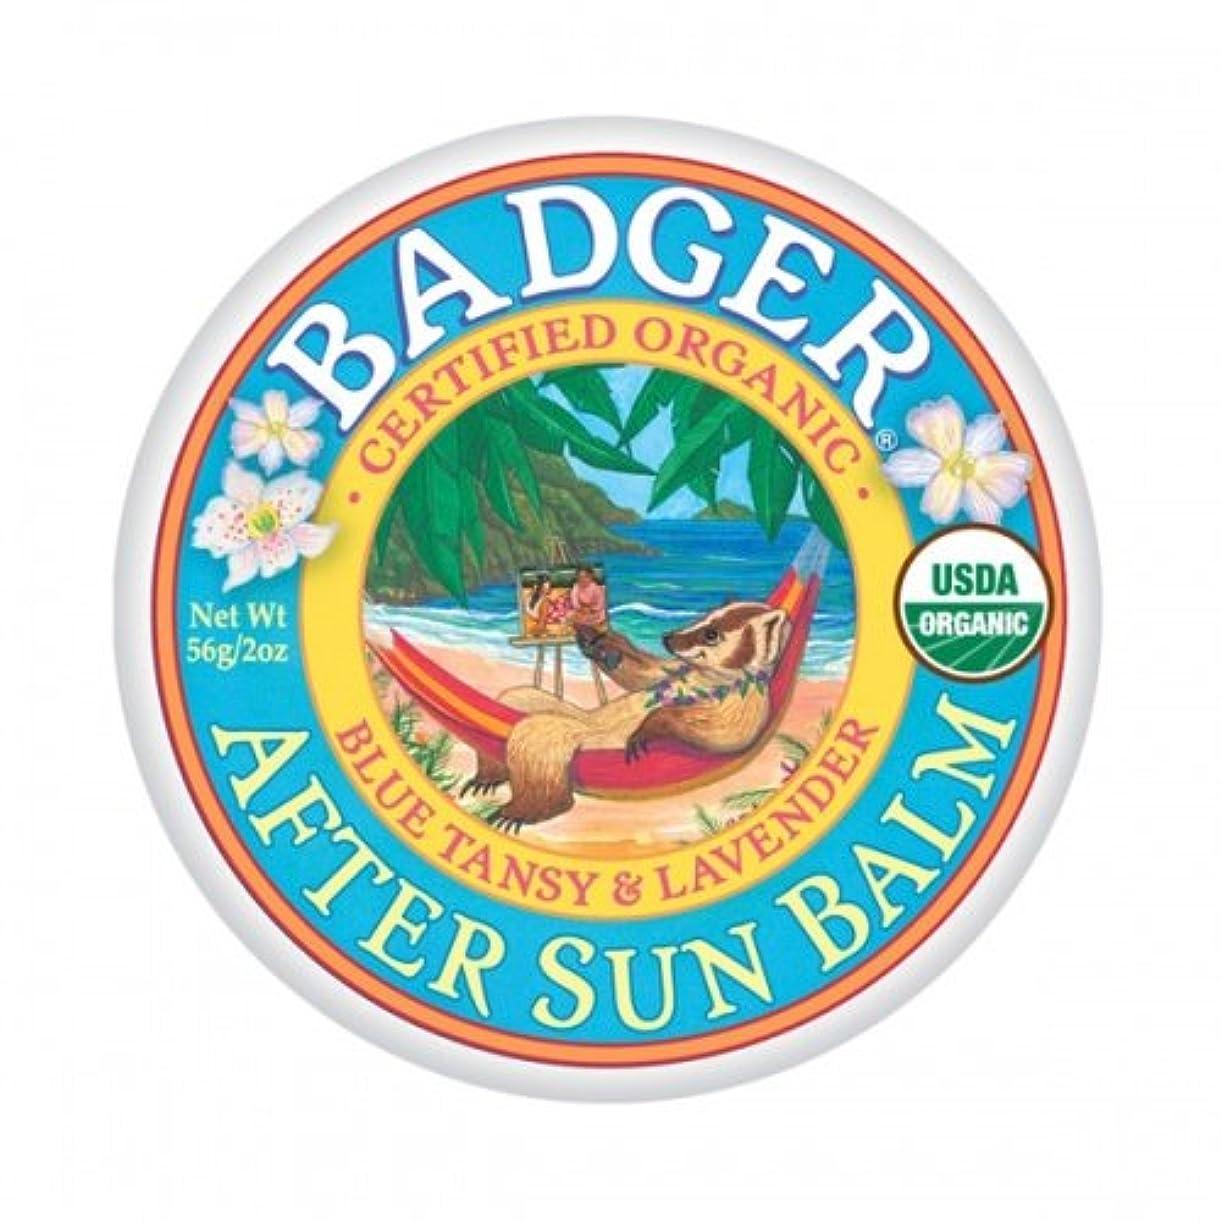 Badger バジャー オーガニックアフターサンバーム 【日焼け後クリーム】【大サイズ】56g【海外直送品】【並行輸入品】